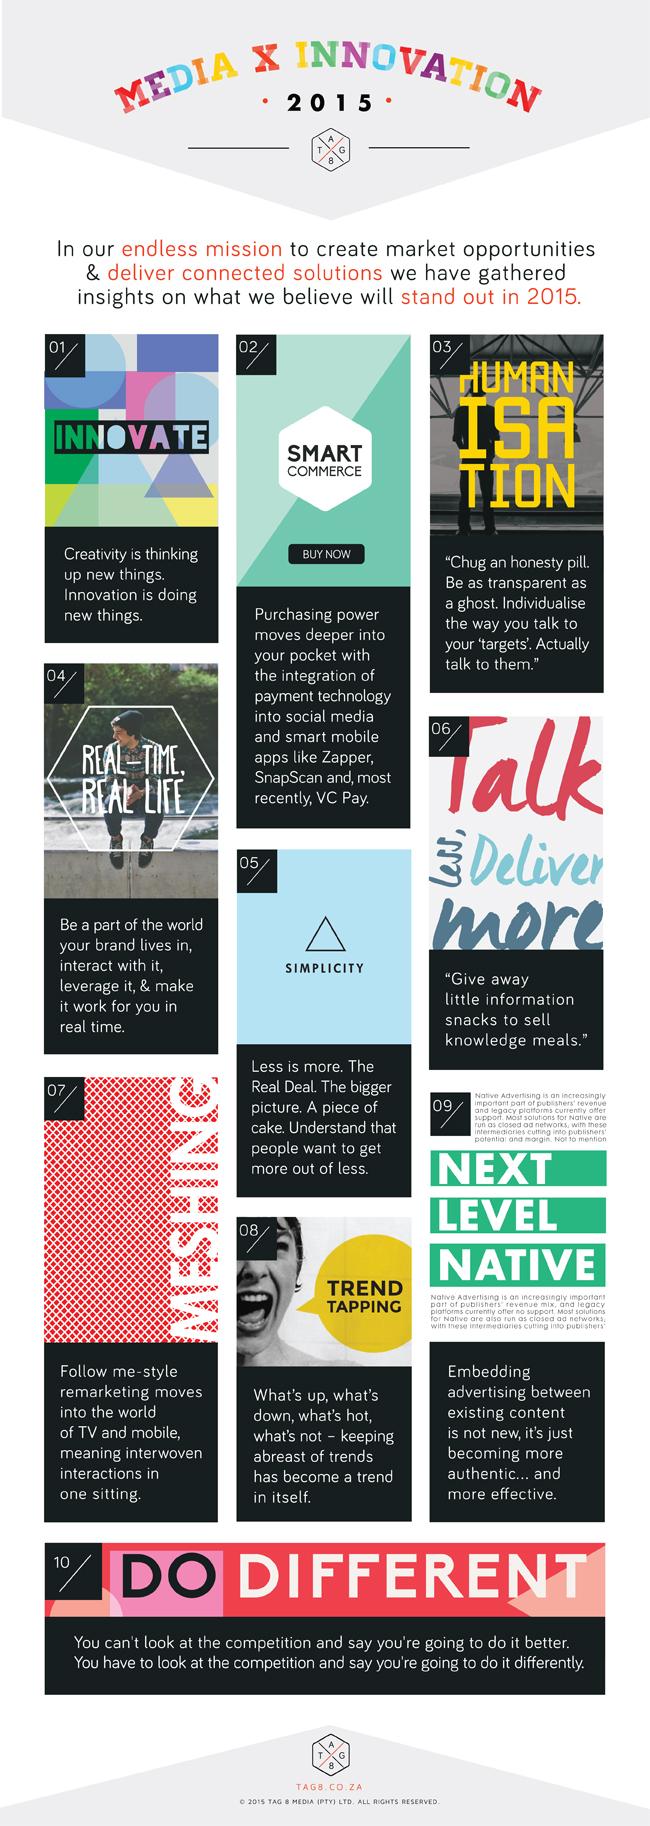 Innovative marketing ideas for 2015